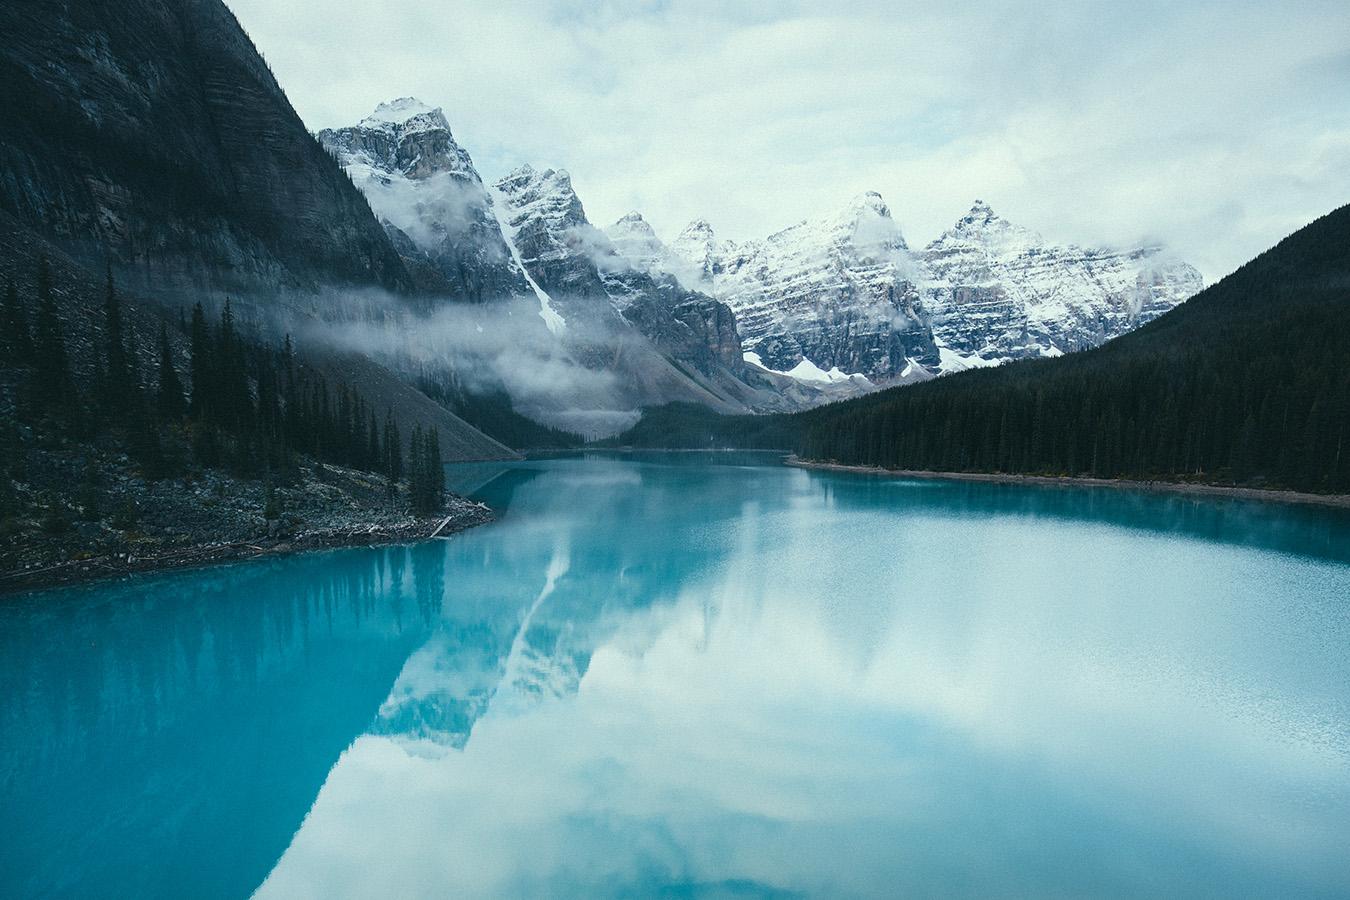 Lake Moraine, Kanada